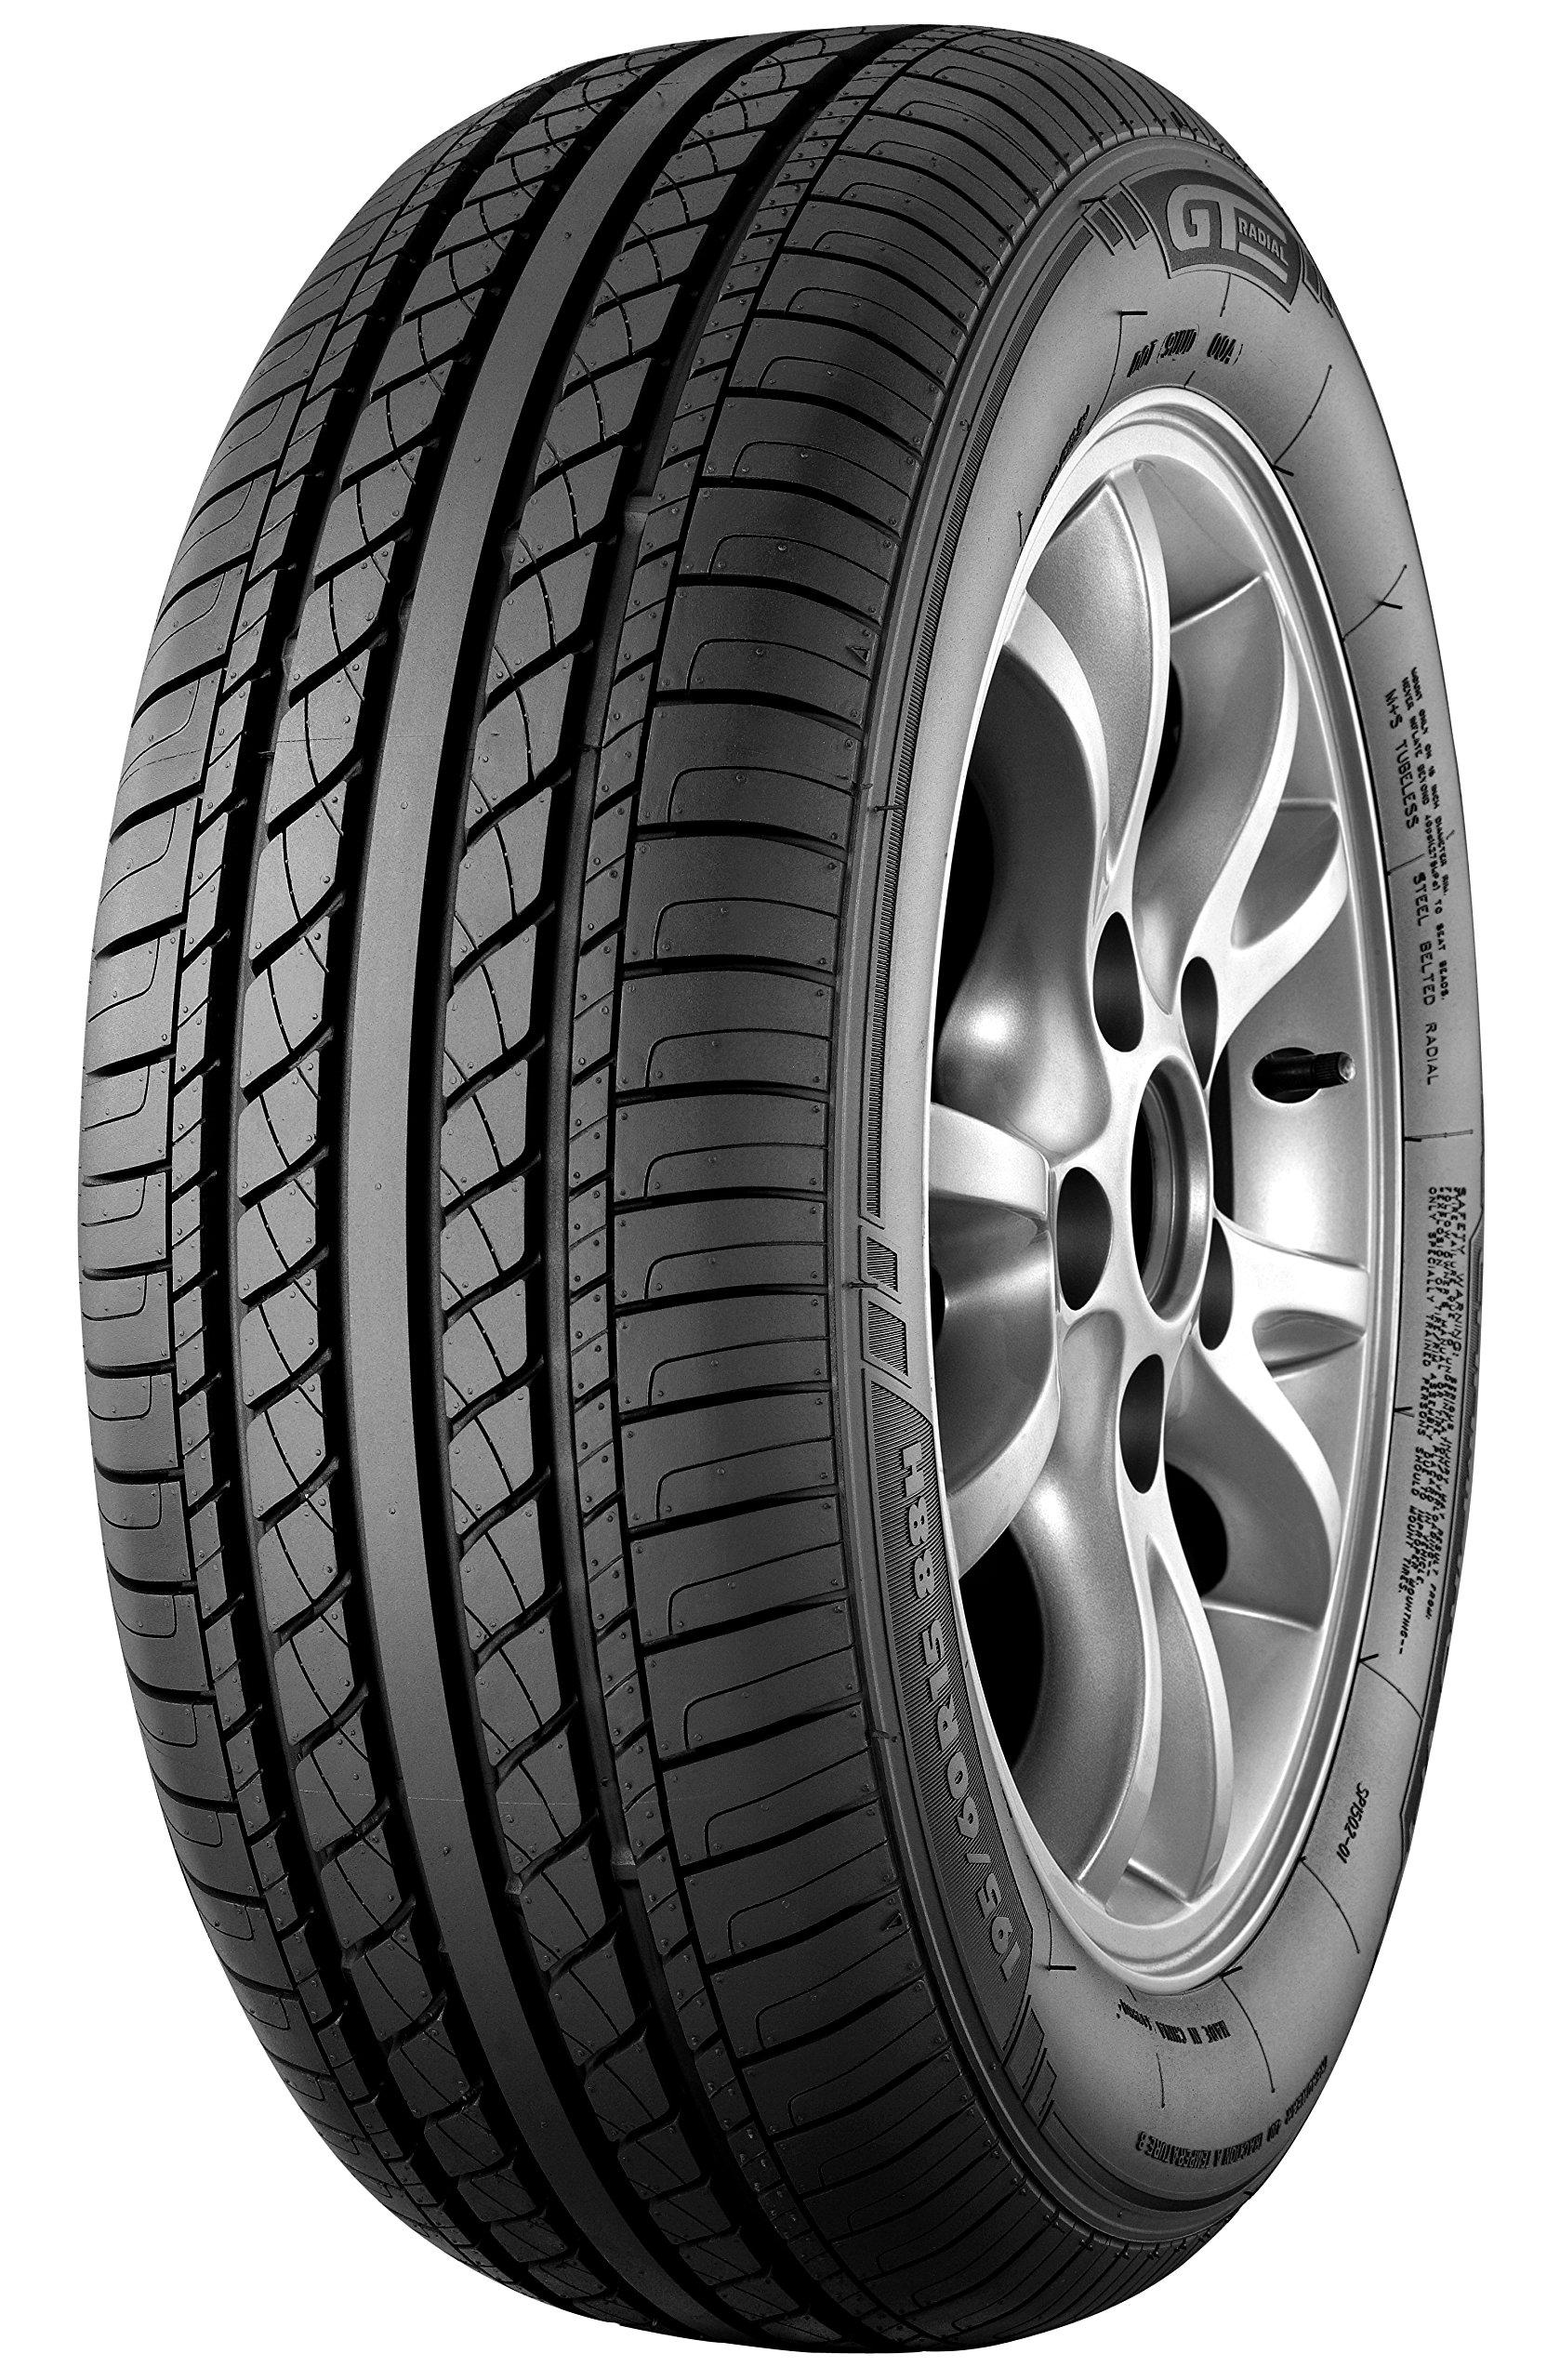 GT Radial CHAMPIRO VP1 All-Season Radial Tire - 185/65R15 88H by GT Radial (Image #2)